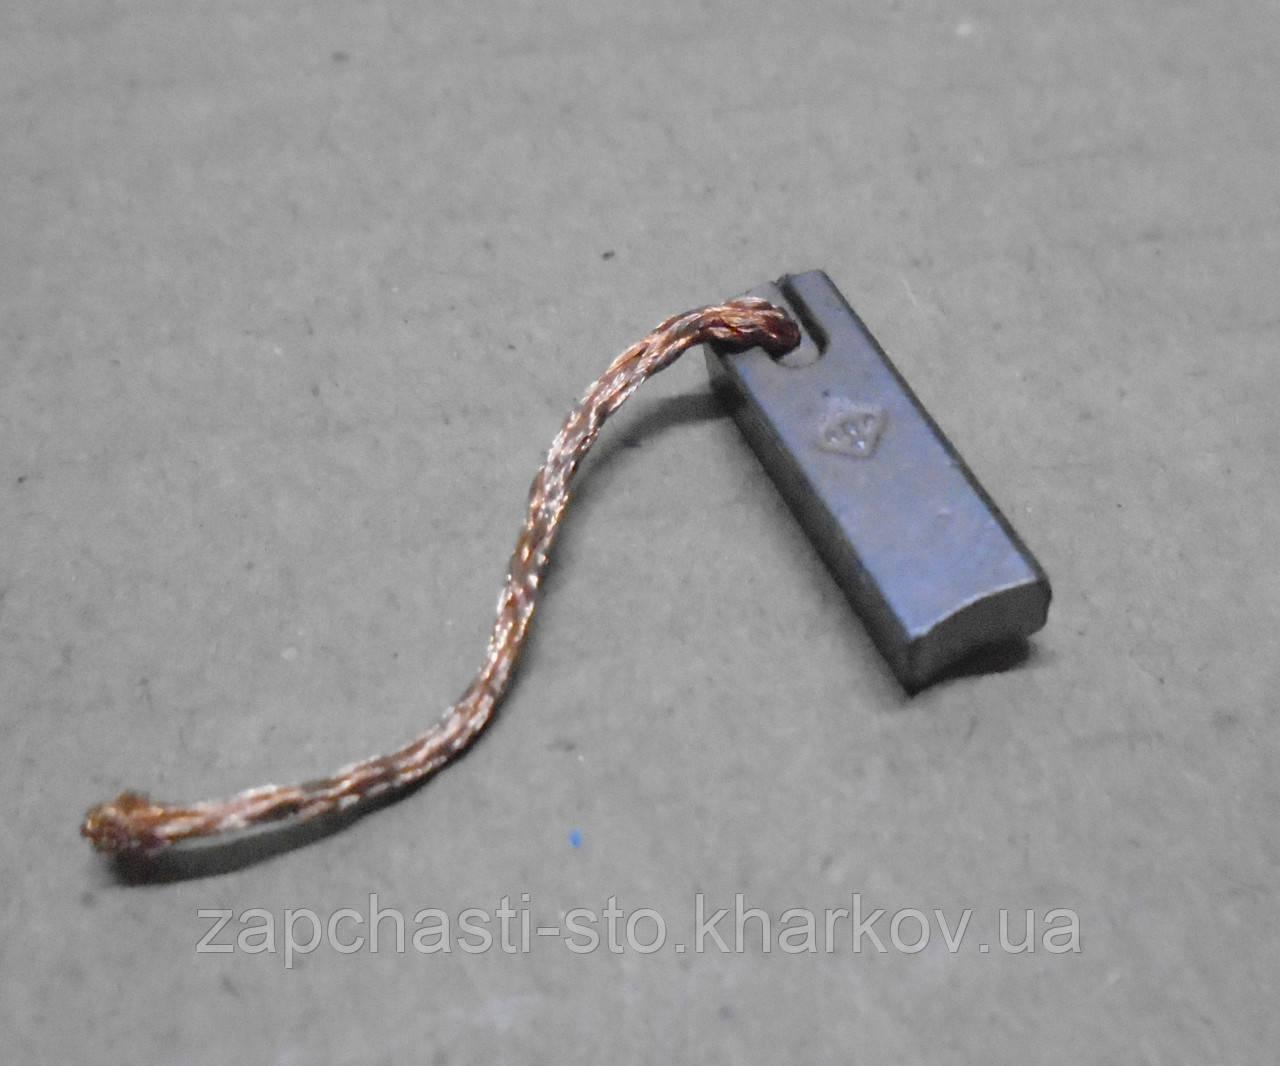 Уголек, щетки генератора, регулятора на иномарки 4Х6Х19 (ЭМИ) 1шт